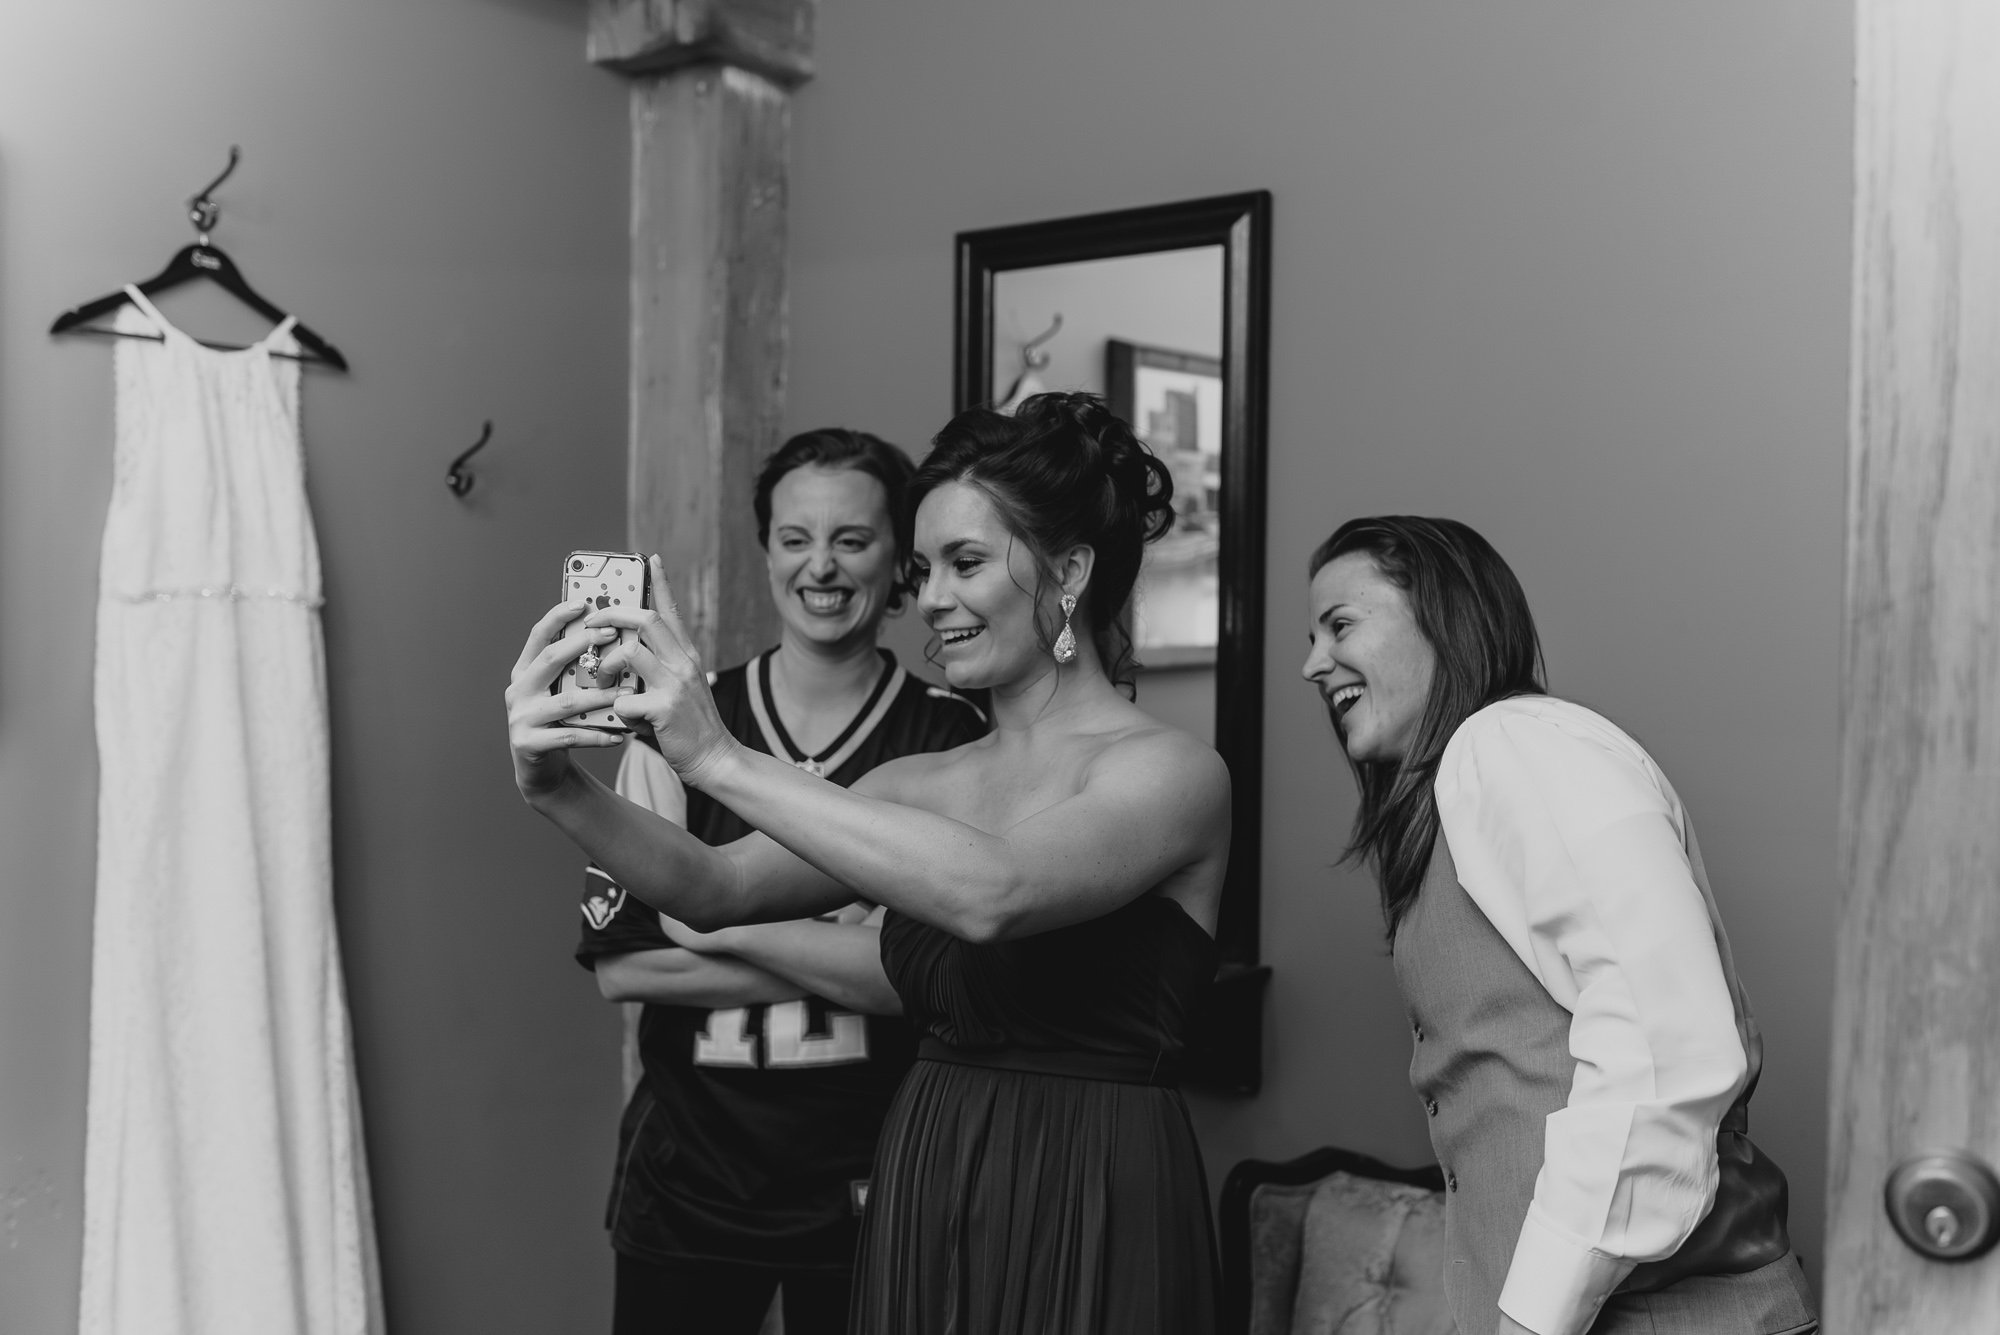 prairie-street-brewhouse-wedding-Rockford-IL-wedding-photographers-21.jpg